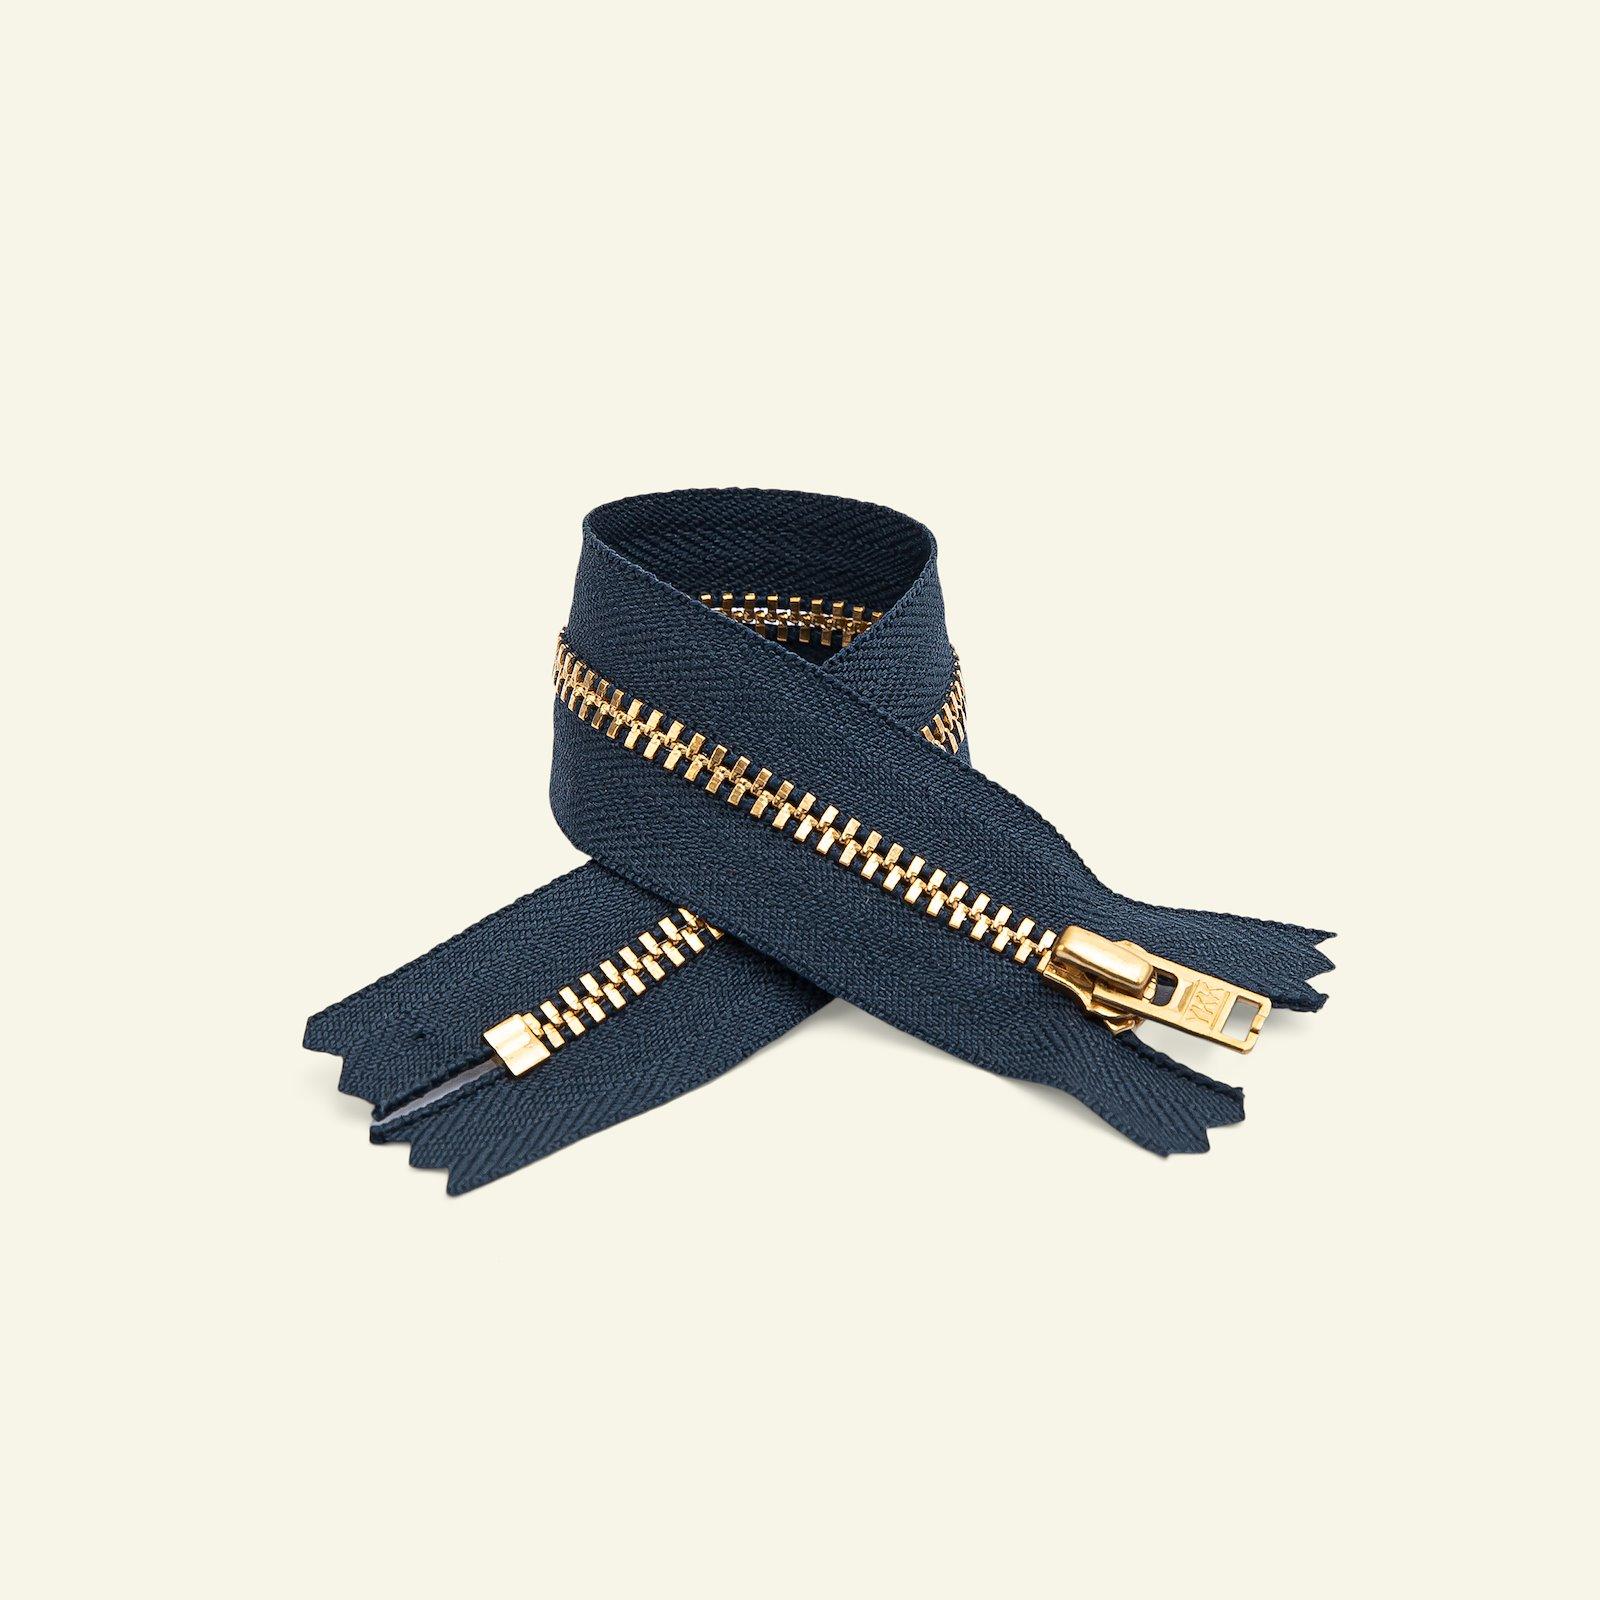 YKK zip 4mm trousers closed 8cm navy x40023_pack